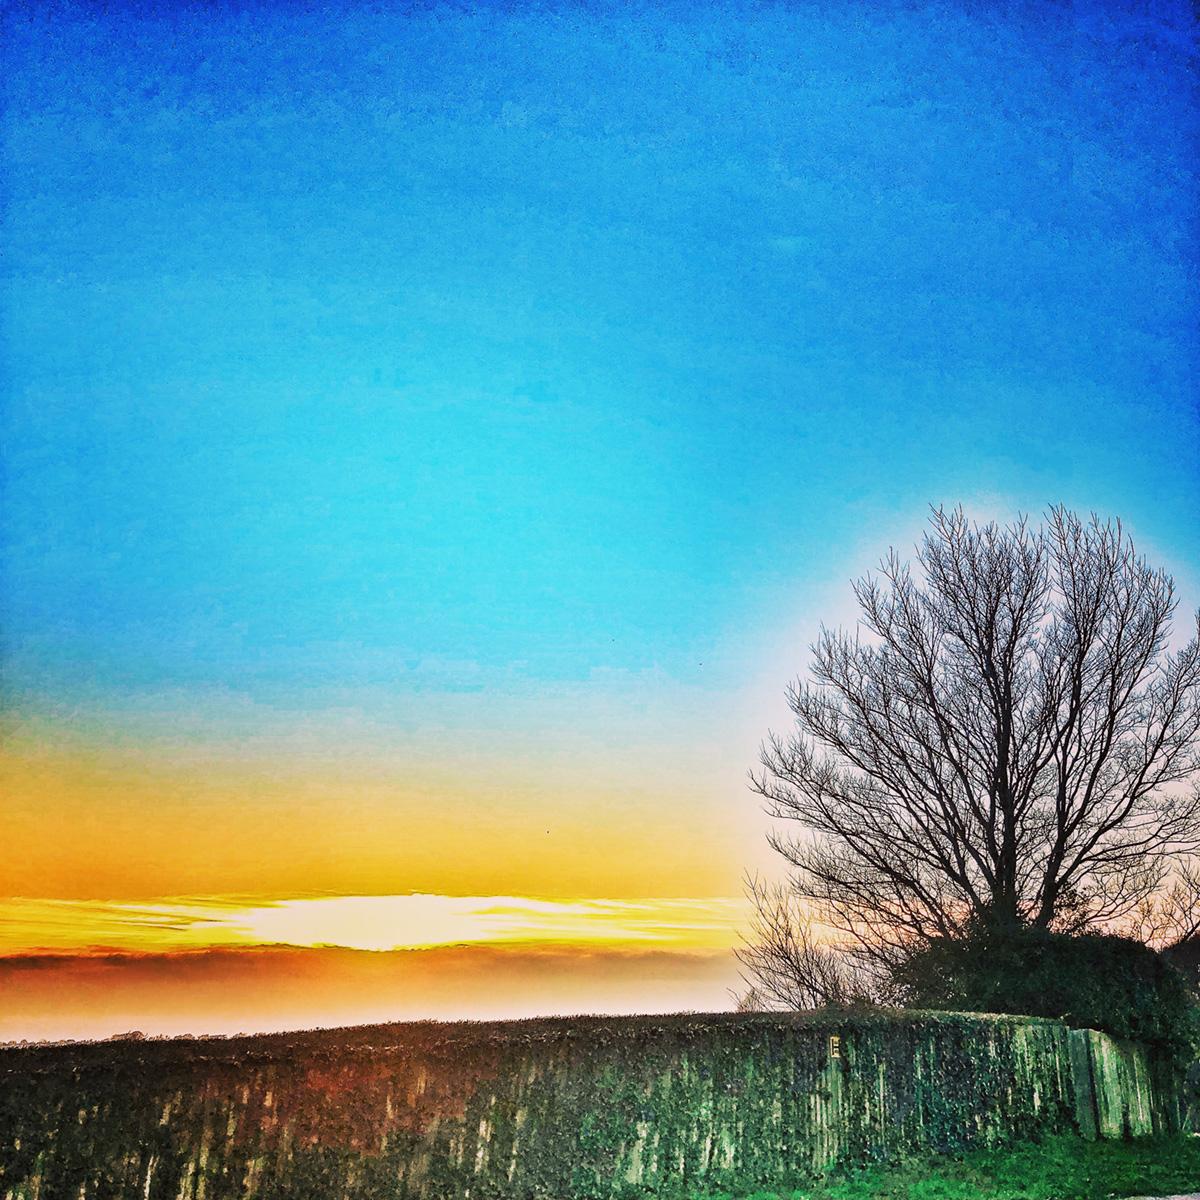 Bare Tree in the Sky